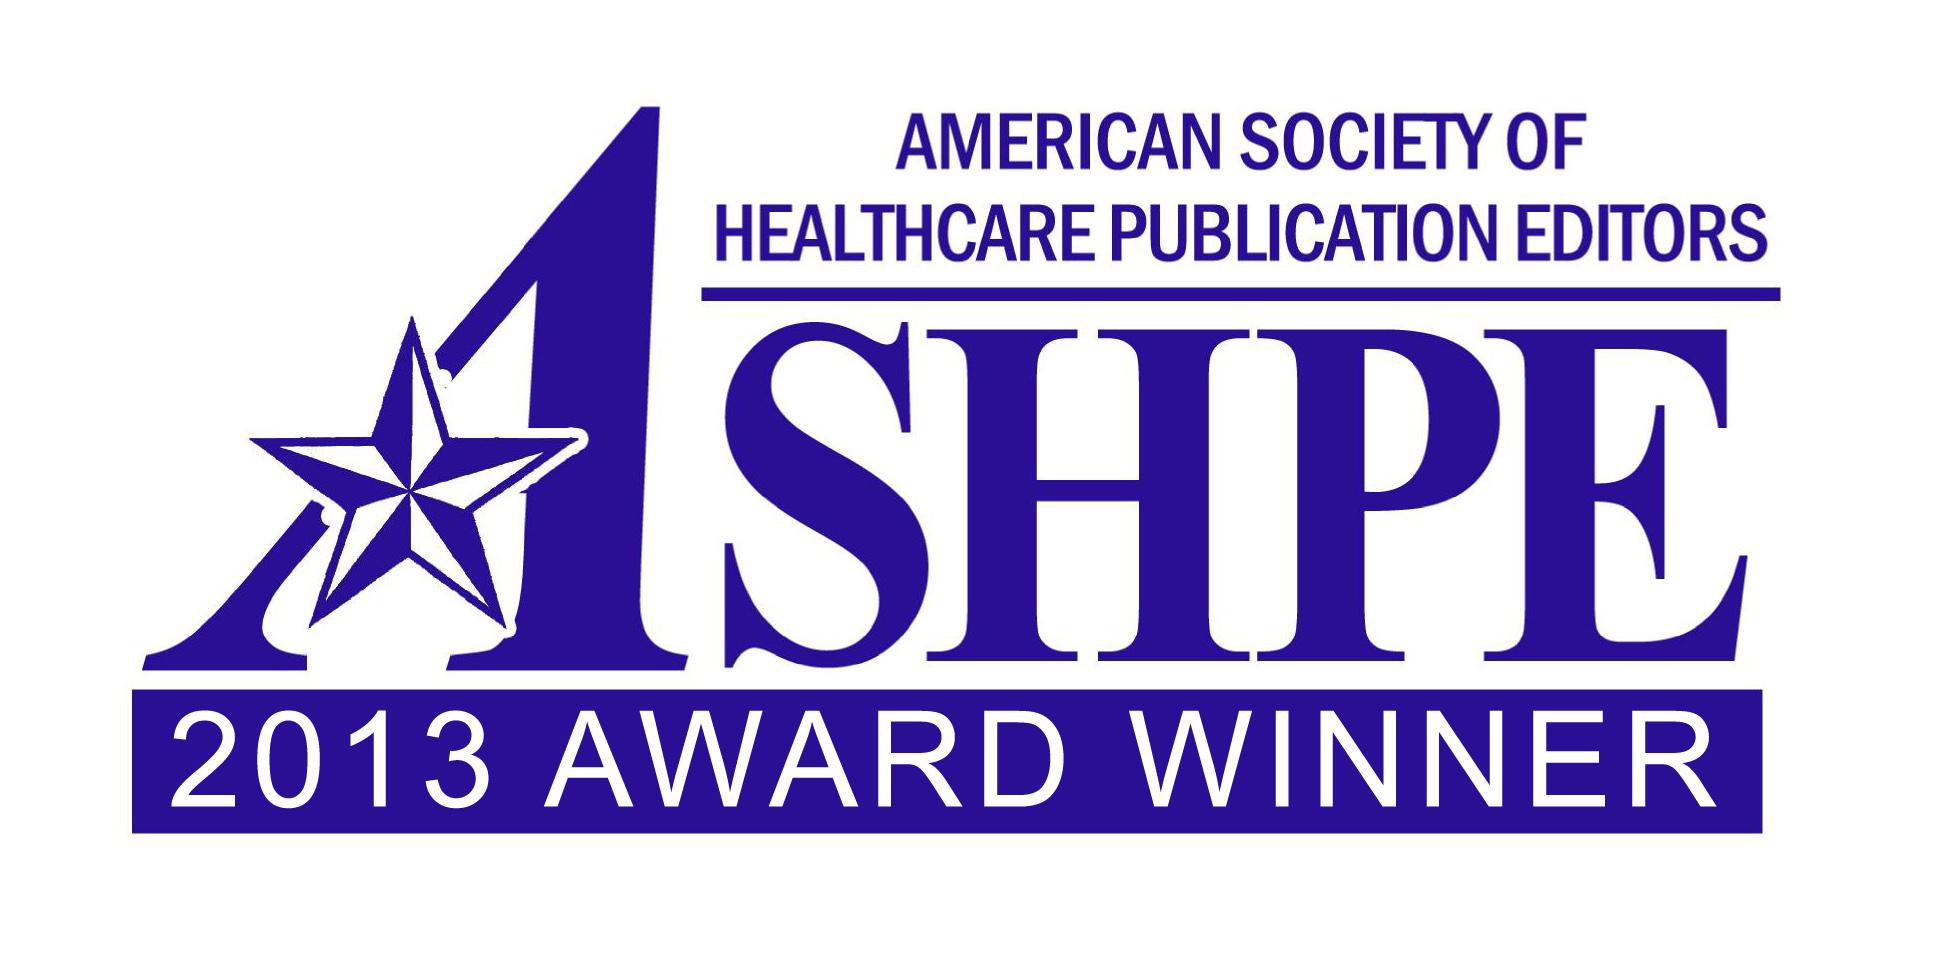 McKnight's double-Gold raises ASHPE awards total to 49